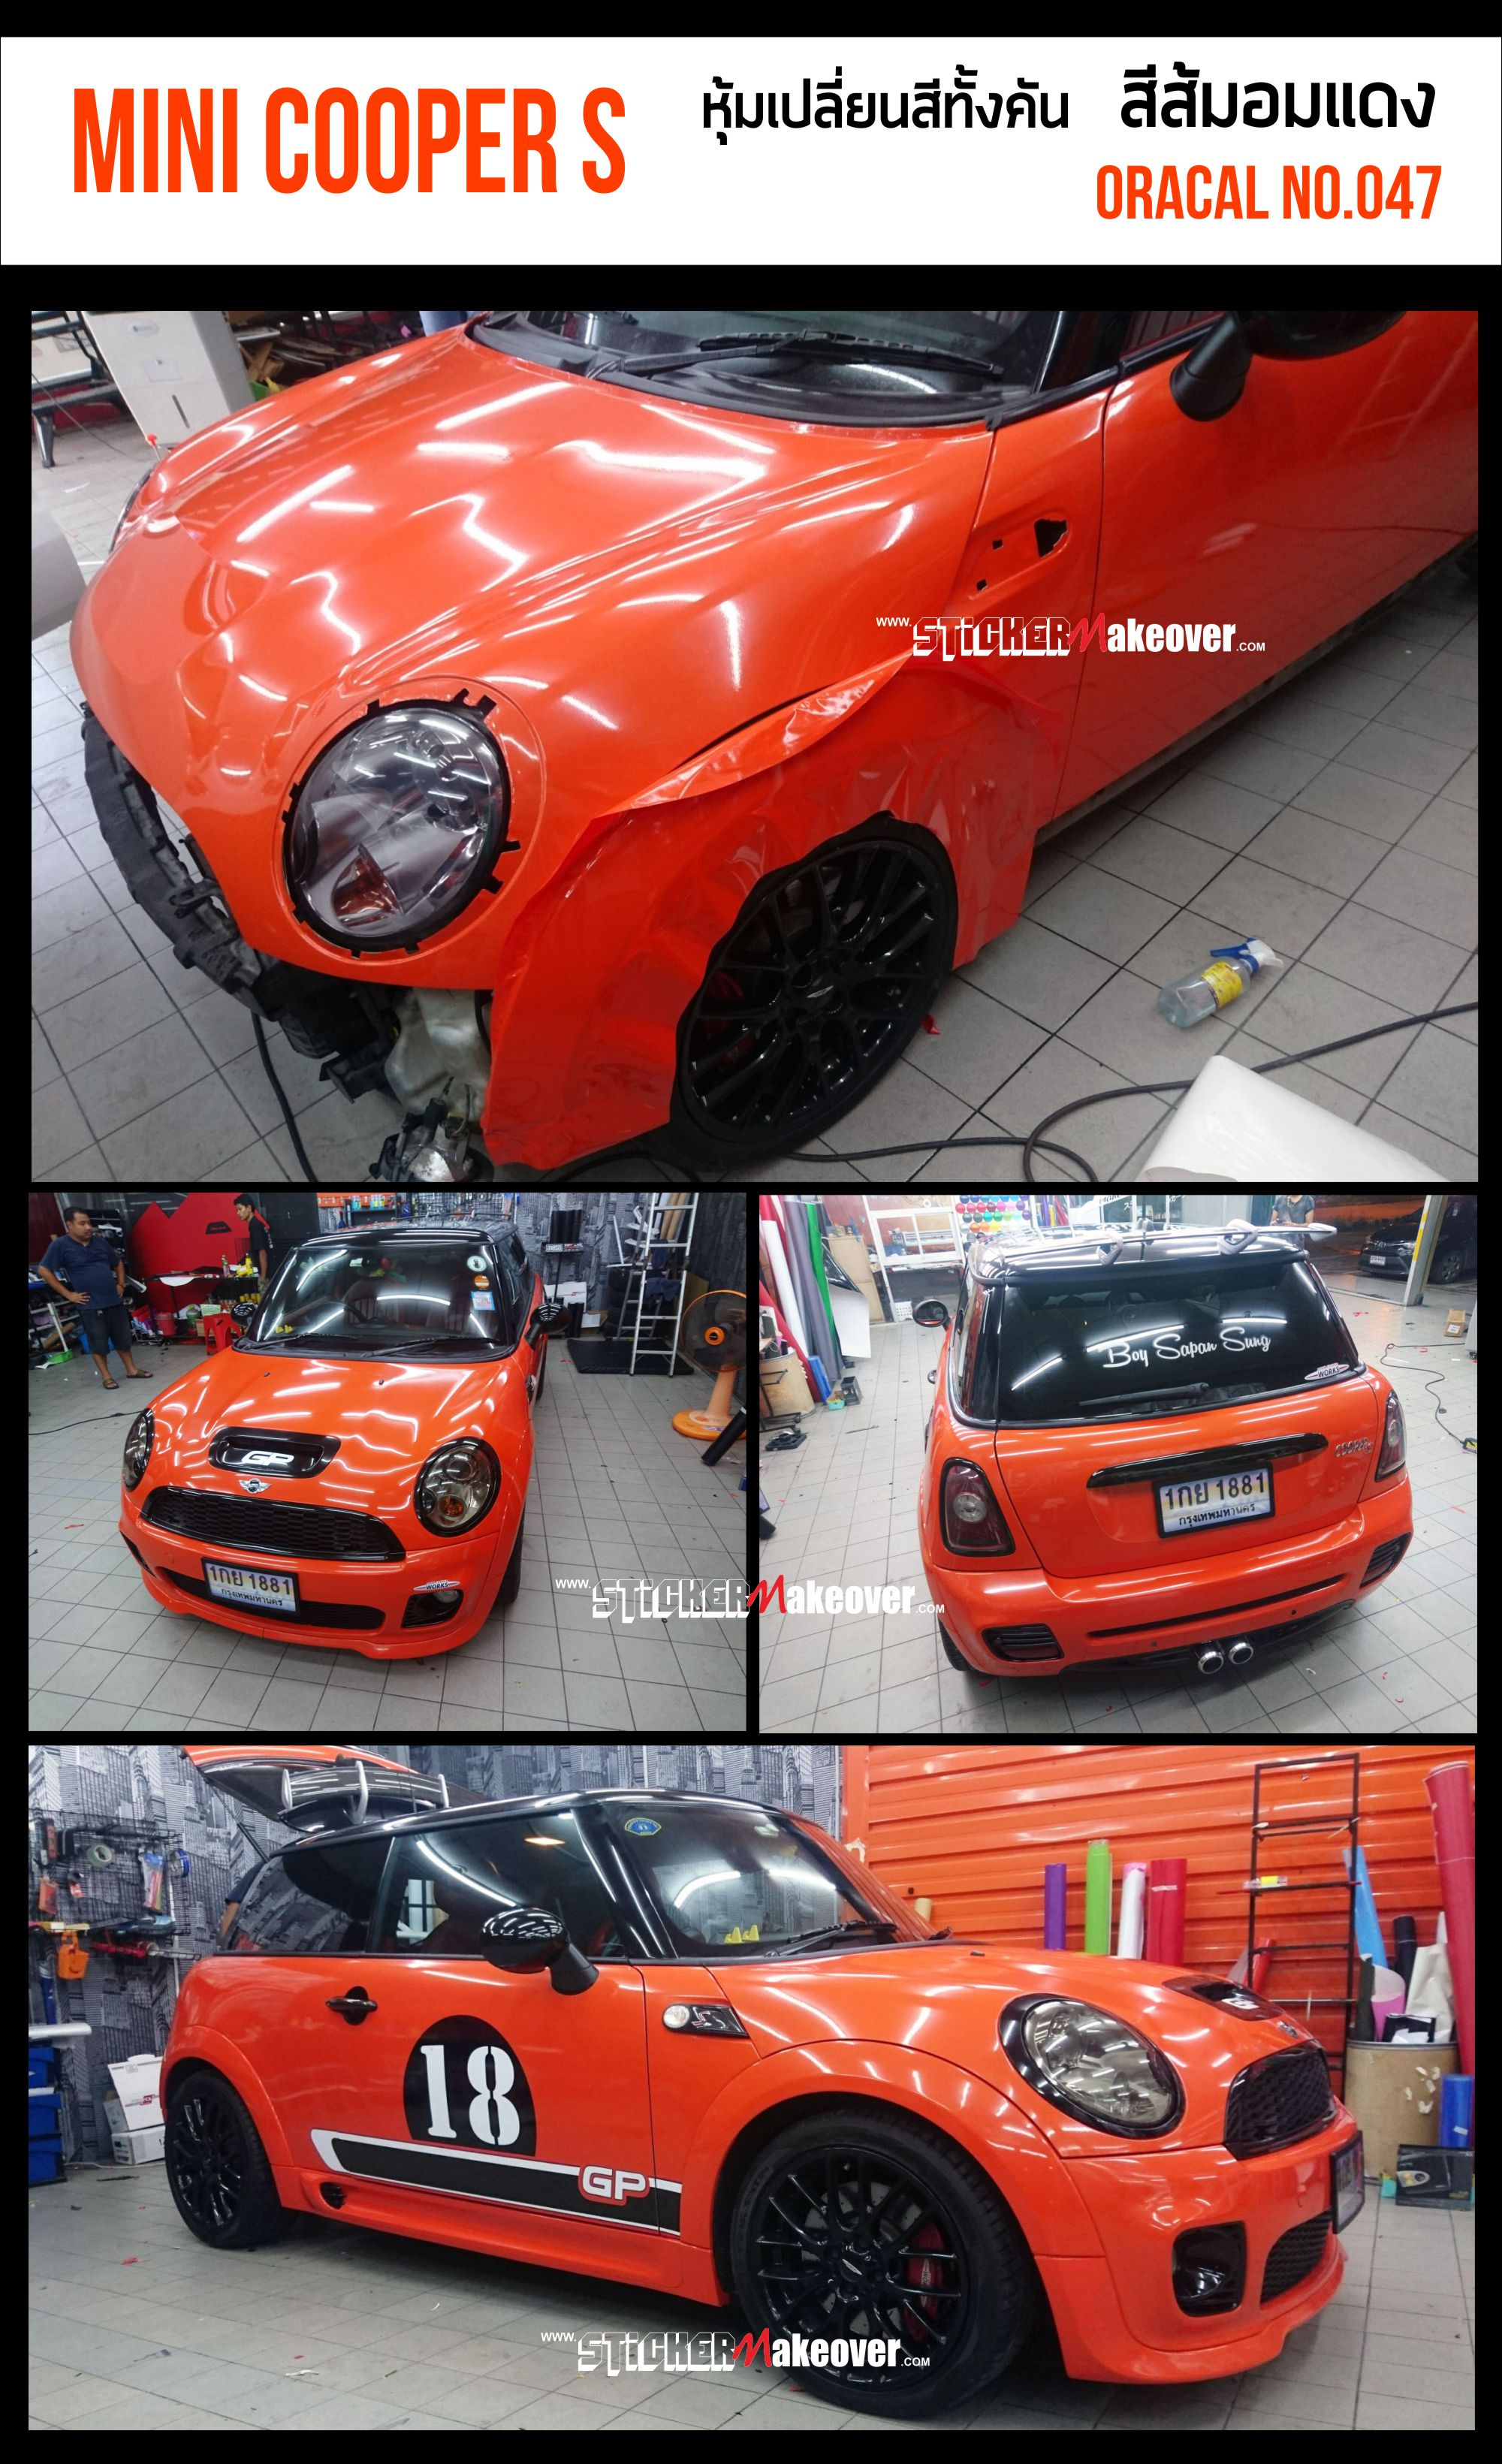 wrap car ฟิล์มหุ้มเปลี่ยนสีรถ wrap mini cooperS สีส้ม เปลี่ยนสีรถทั้งคันด้วยสติกเกอร์ wrapเปลี่ยนสีรถมินิ คูเปอร์ มินิเเต่งสวย เปลี่ยนสีมินิคูเปอร์